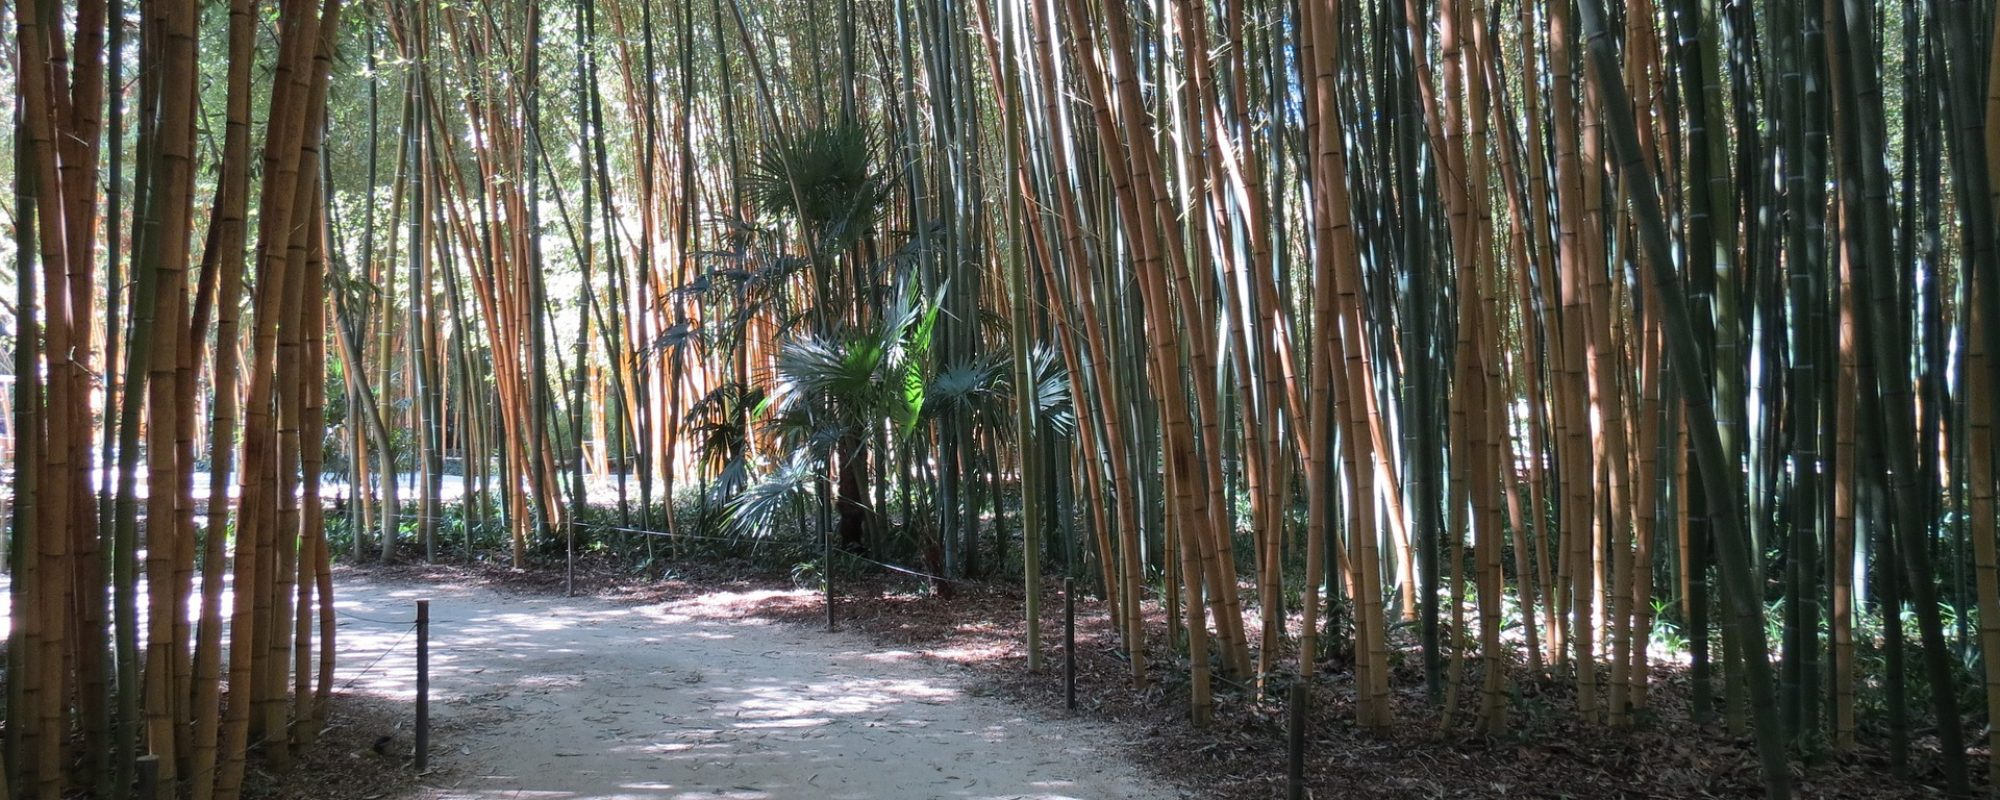 bamboo-1808076_1920